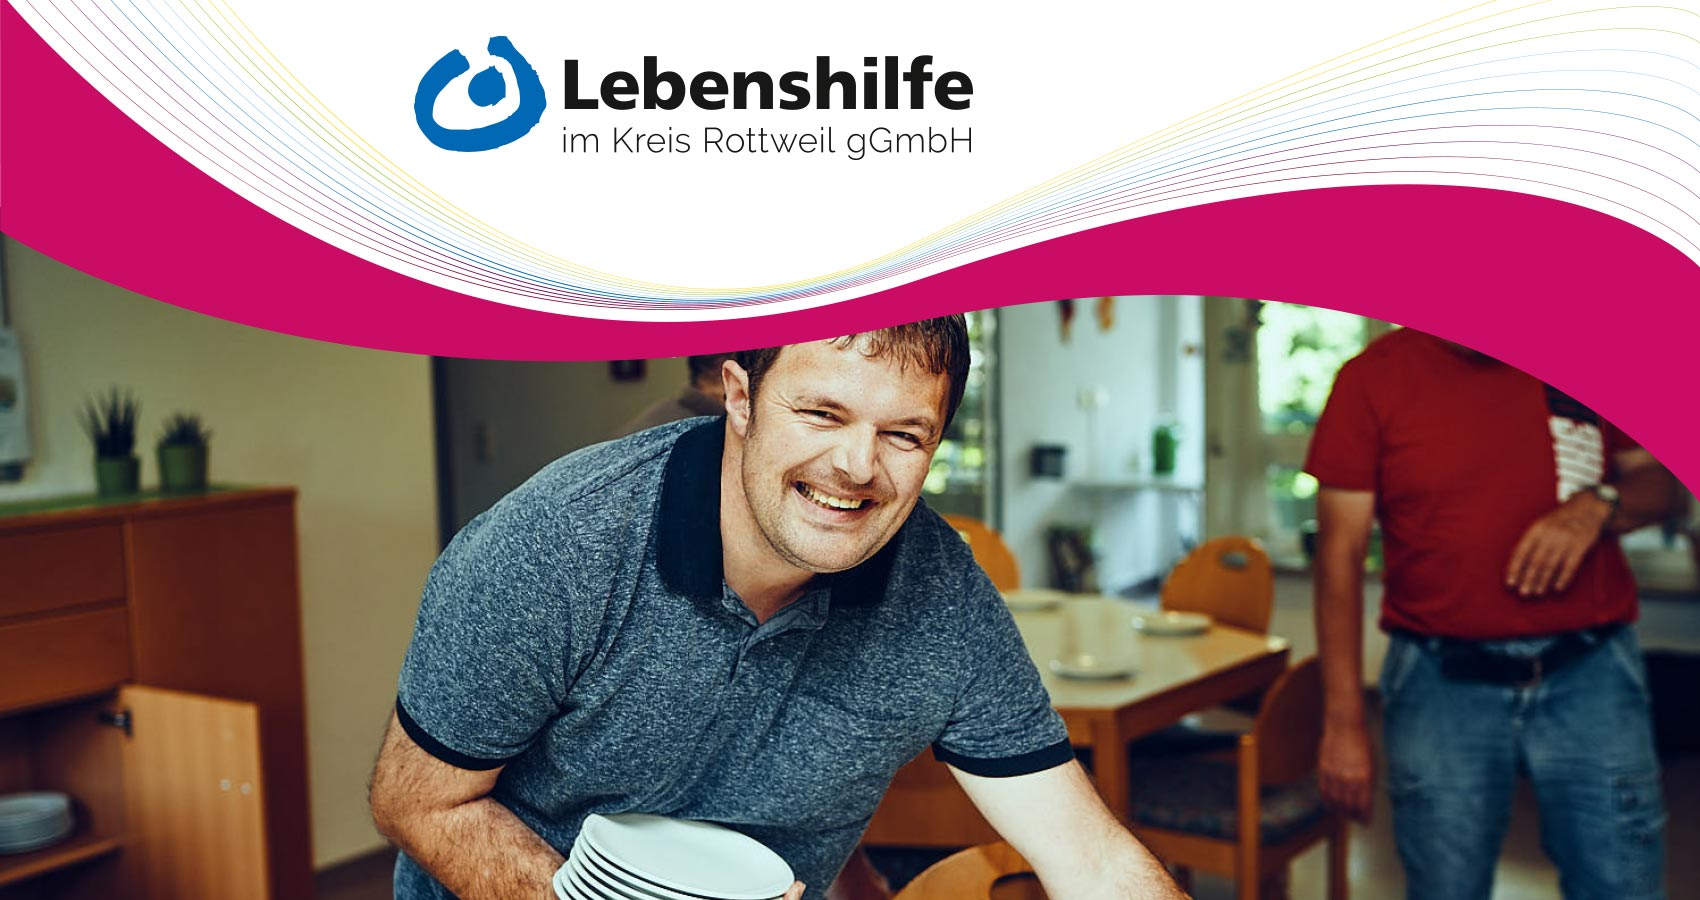 Lebenshilfe im Kreis Rottweil gGmbH - Wohnangebote - Ambulantes Wohnen